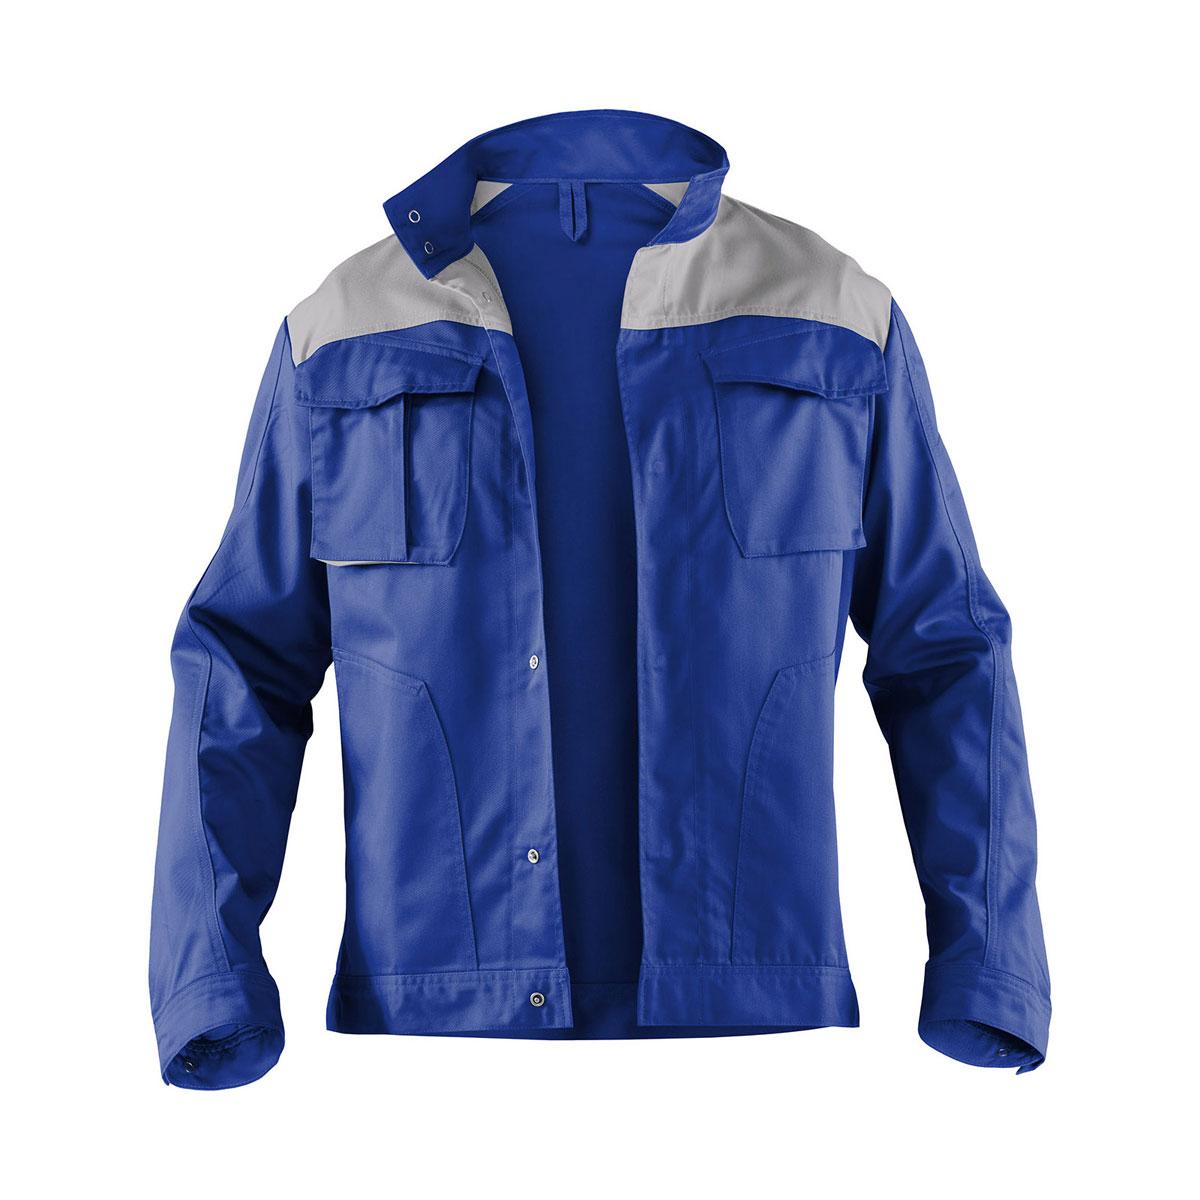 "Jacke ""Identiq mix"", blau, Gr.58 blau | 58"